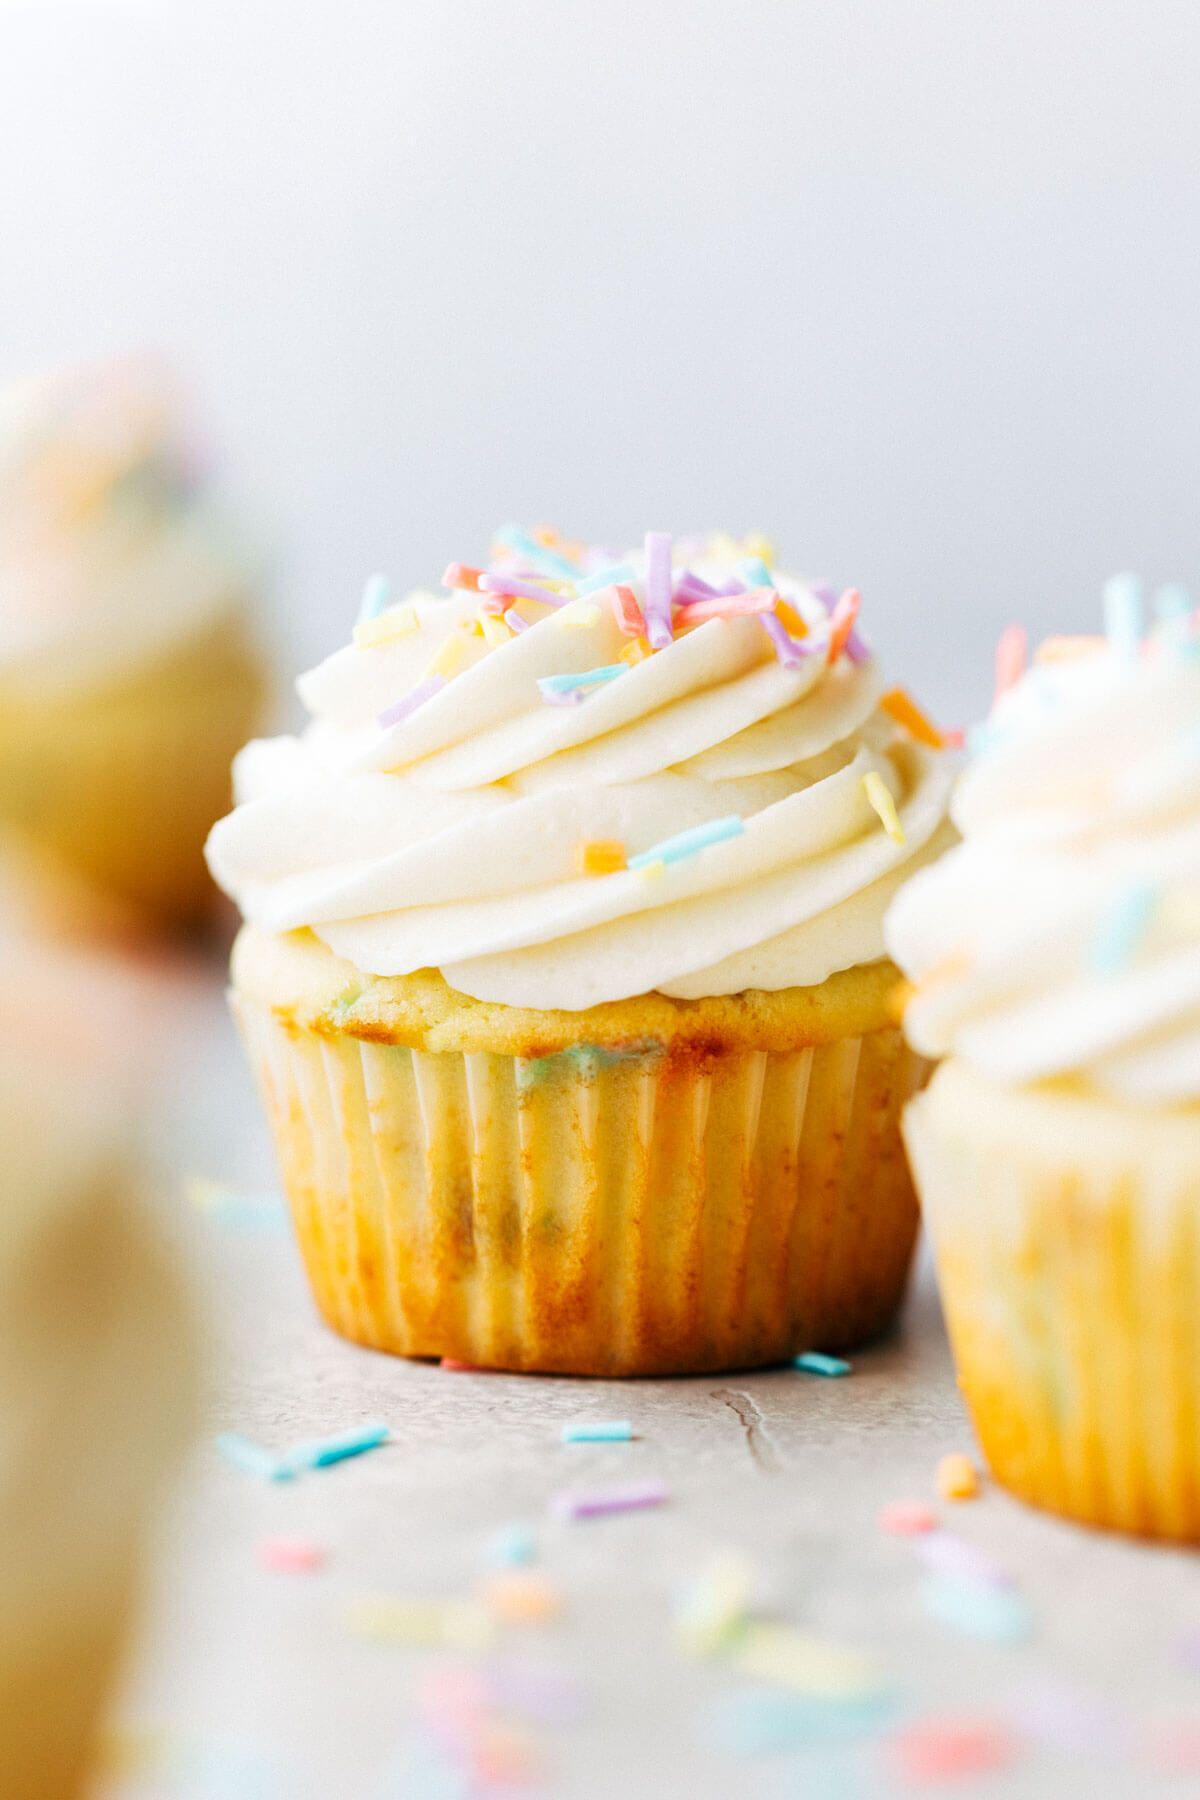 Gehirn Muffin Monsterparty Idee Geburtstagsfeier Dessert